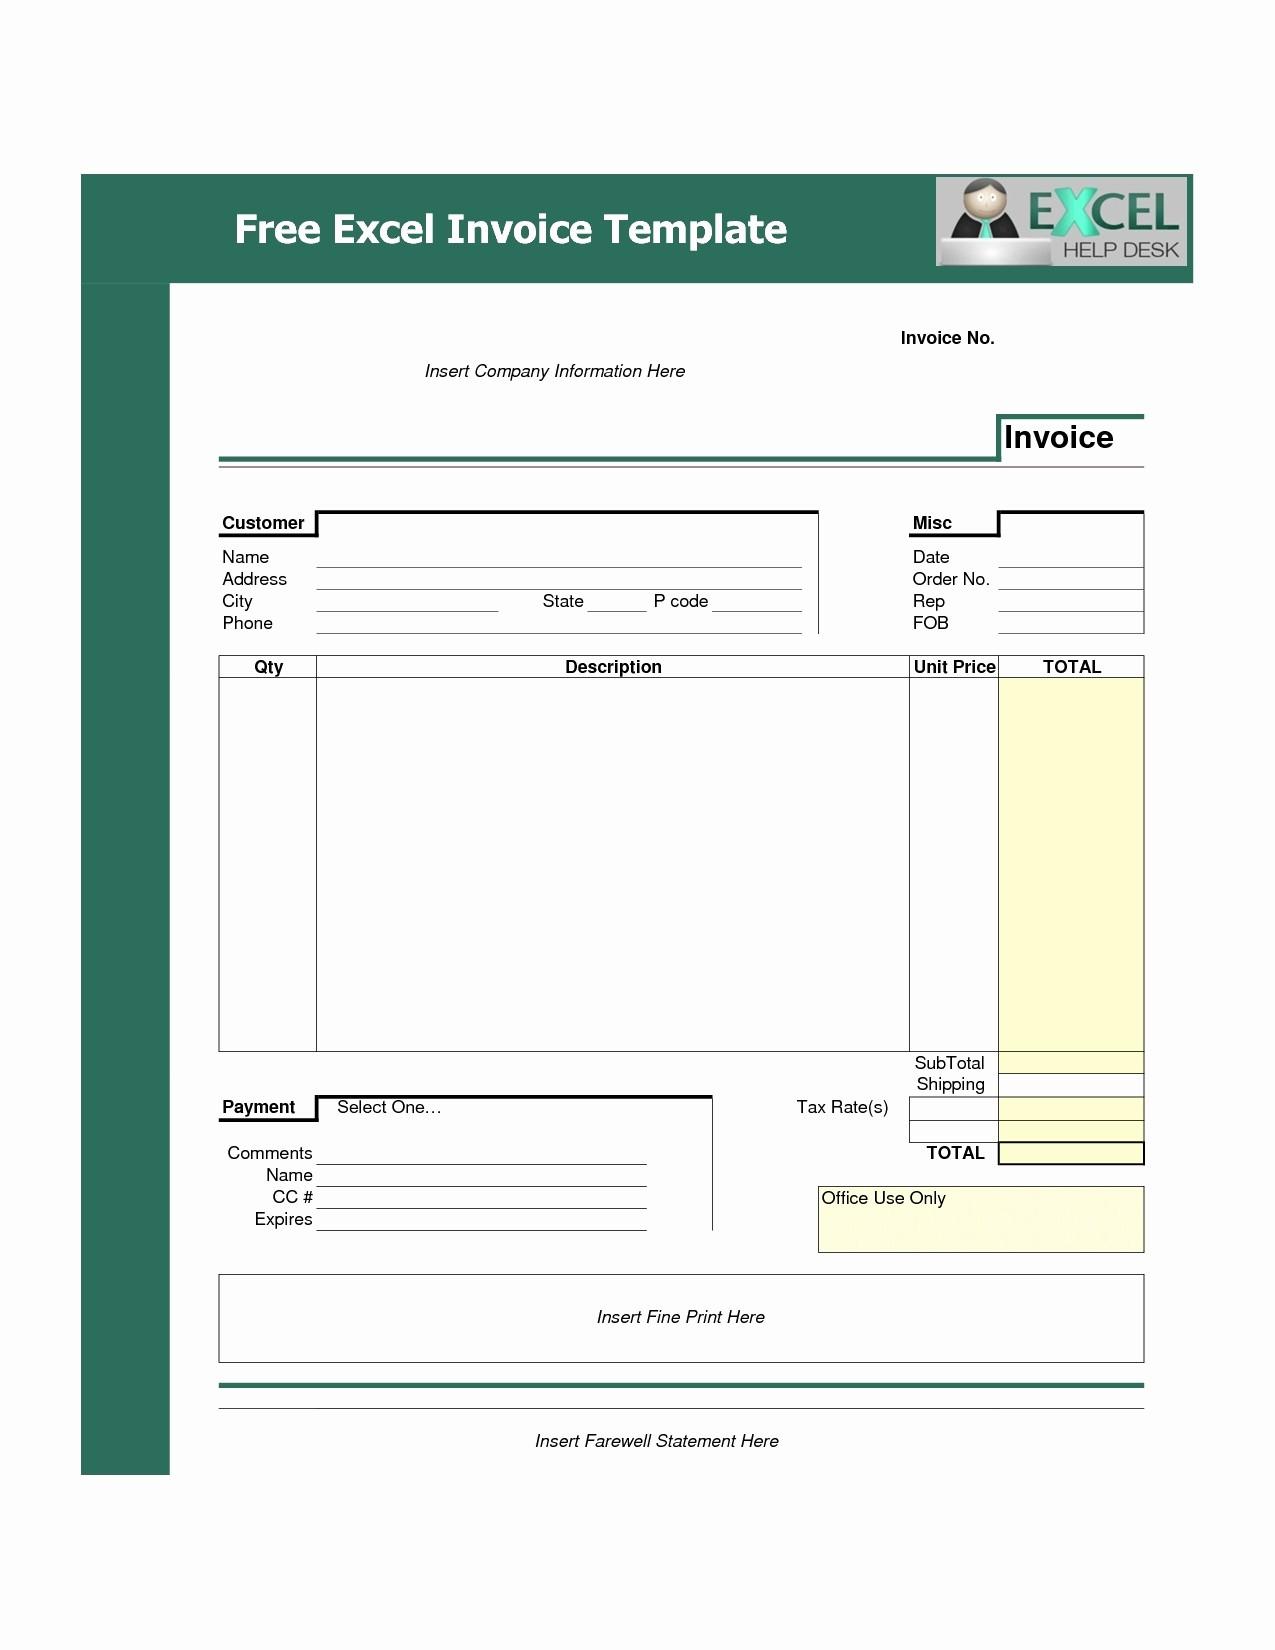 Invoice Bill format In Excel Elegant Tax Invoice format In Excel Free Download Invoice